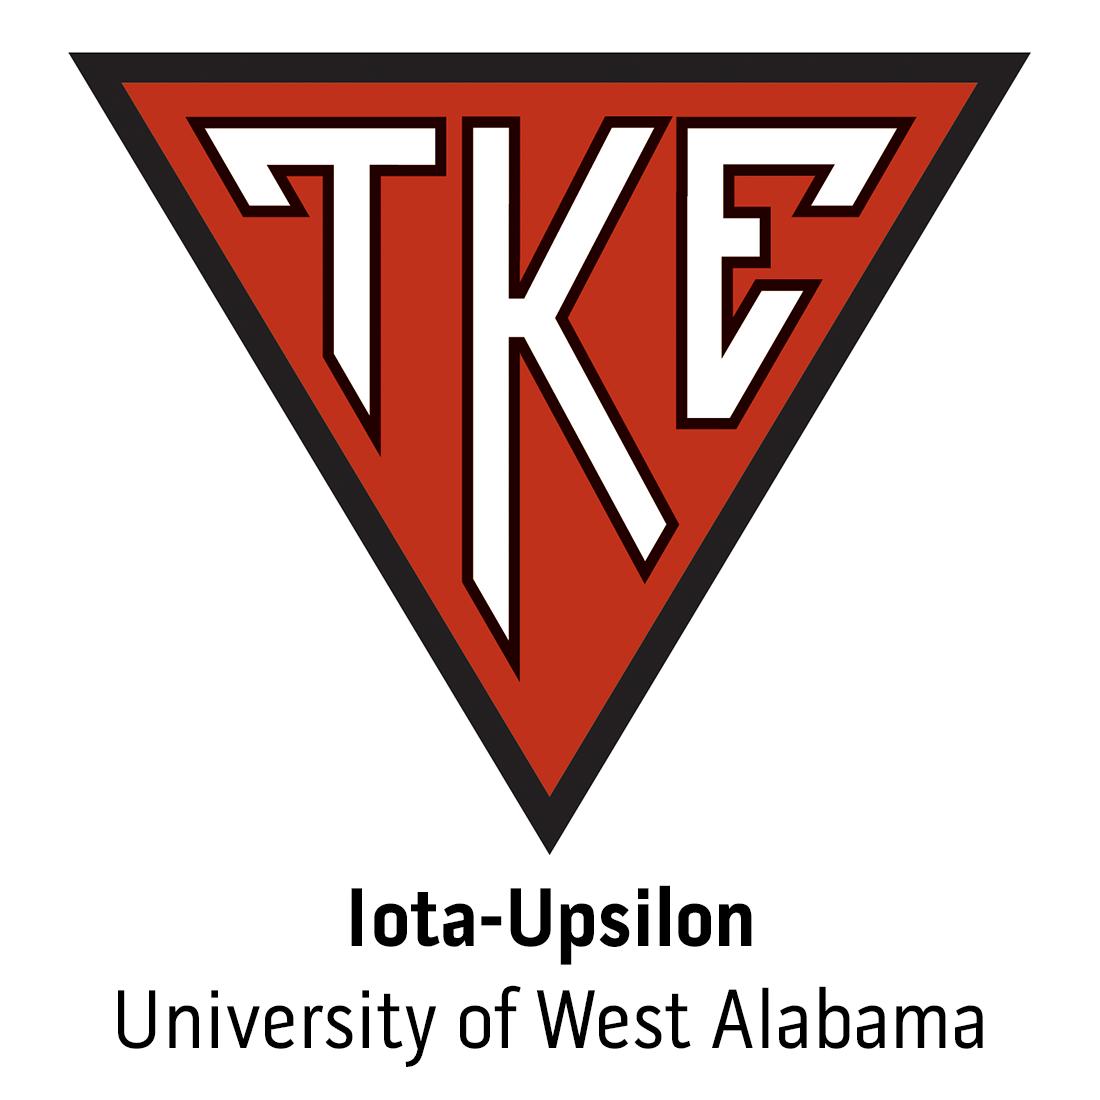 Iota-Upsilon Chapter at University of West Alabama